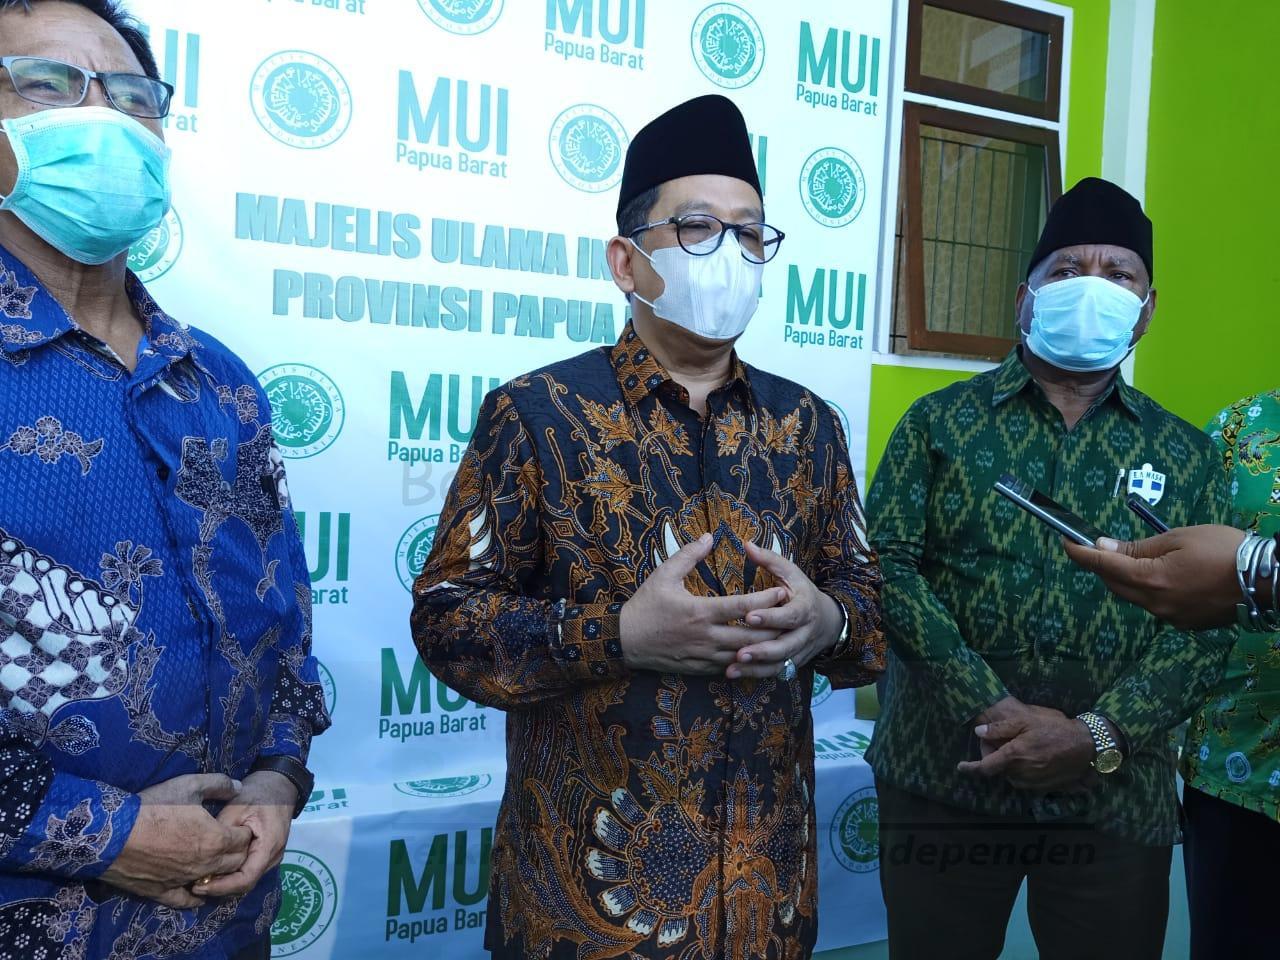 Wakil Menteri Agama Puji Gubernur Mandacan Bisa Jaga Toleransi Umat Beragama 2 IMG 20200821 WA0032